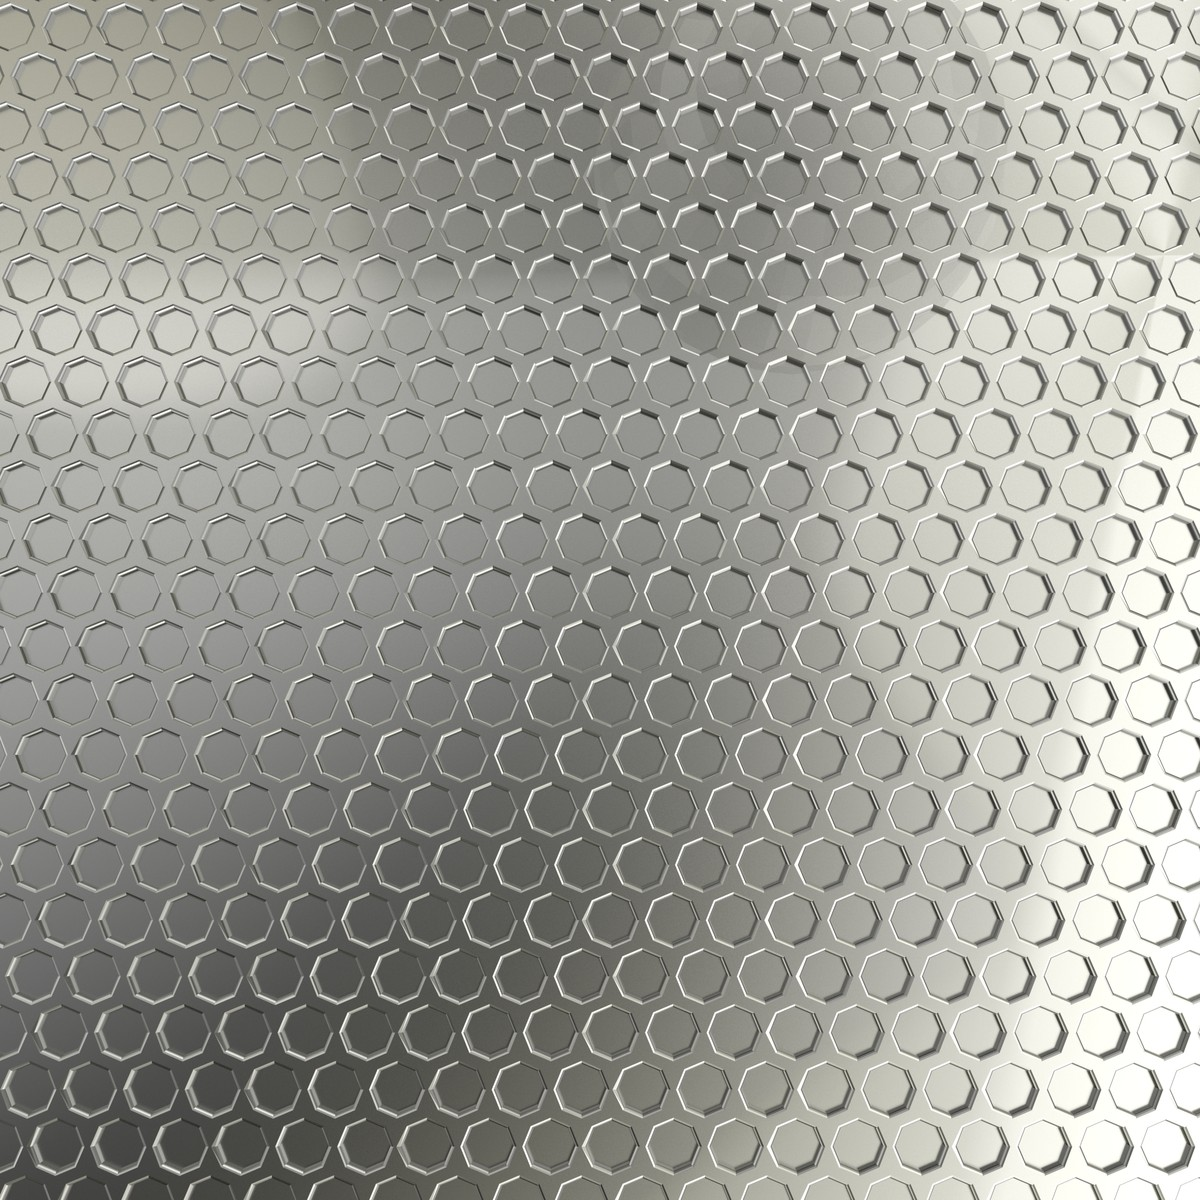 honeycomb metal plate 3d model